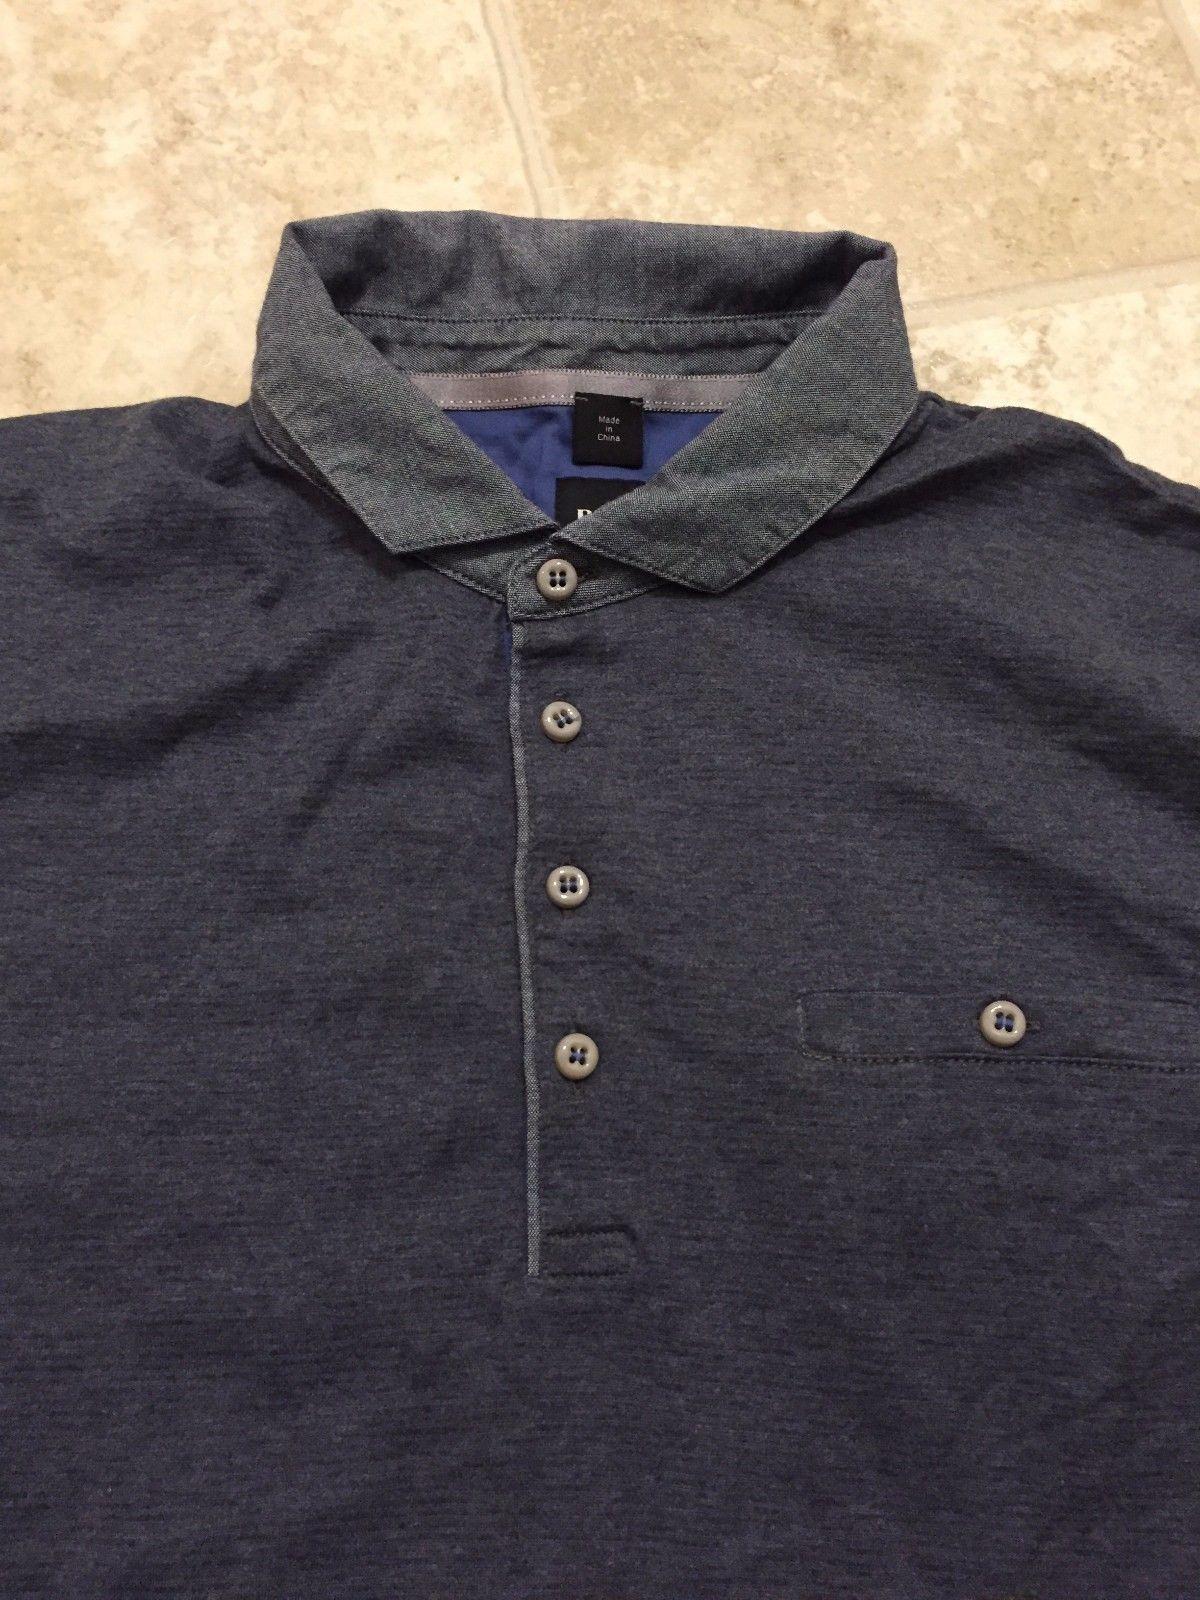 a71f7aa2 S l1600. S l1600. Previous. Hugo Boss Mens Short Sleeve Polo Shirt Cotton  International Size Medium